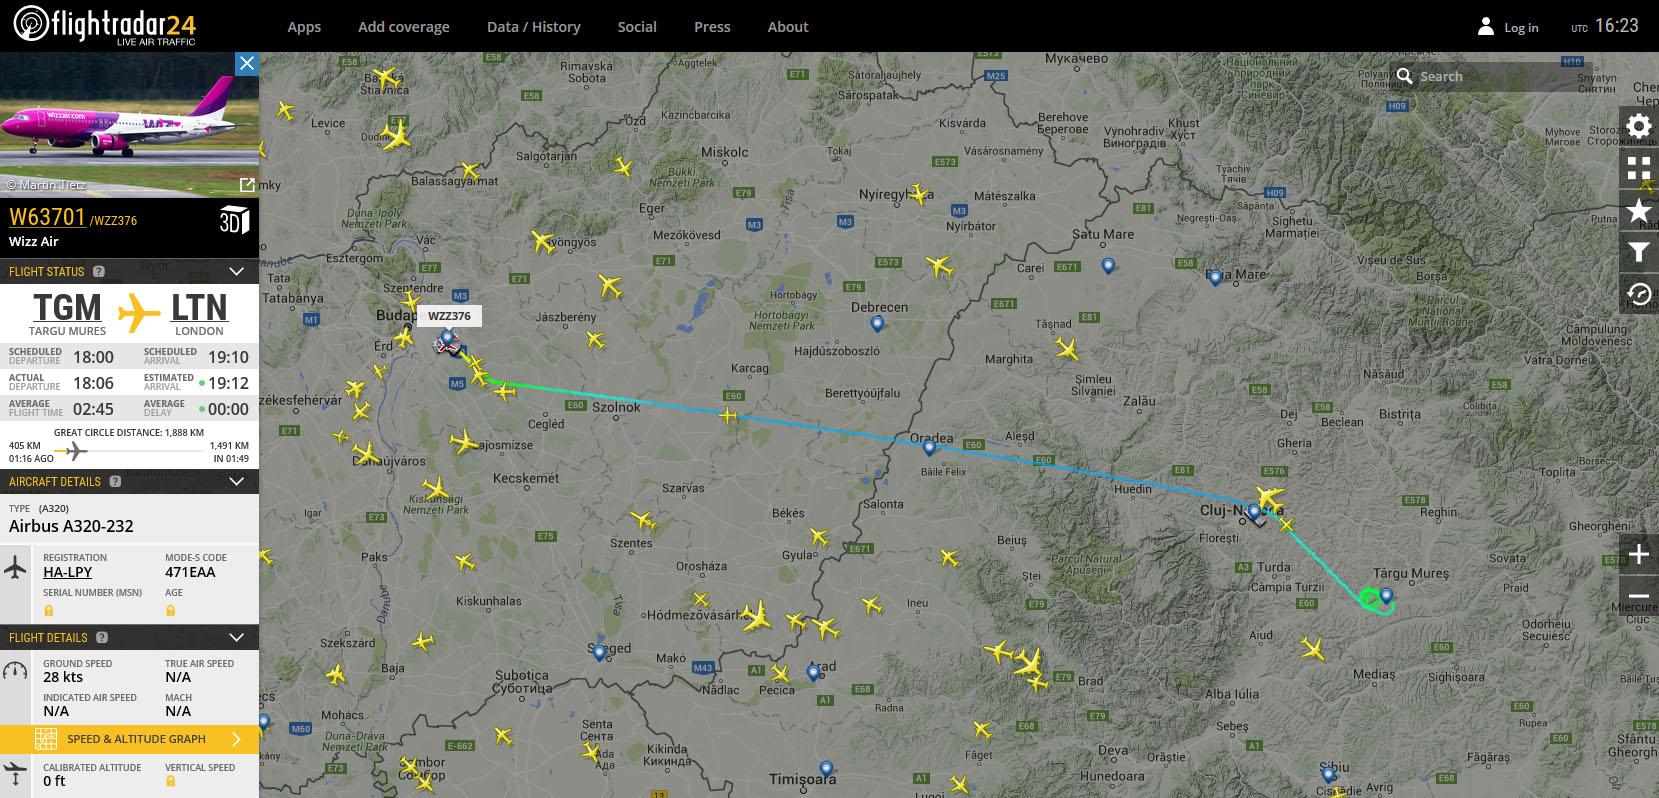 A járat útvonala a Flightradar24.com virtuális radarképén. | © AIRportal.hu